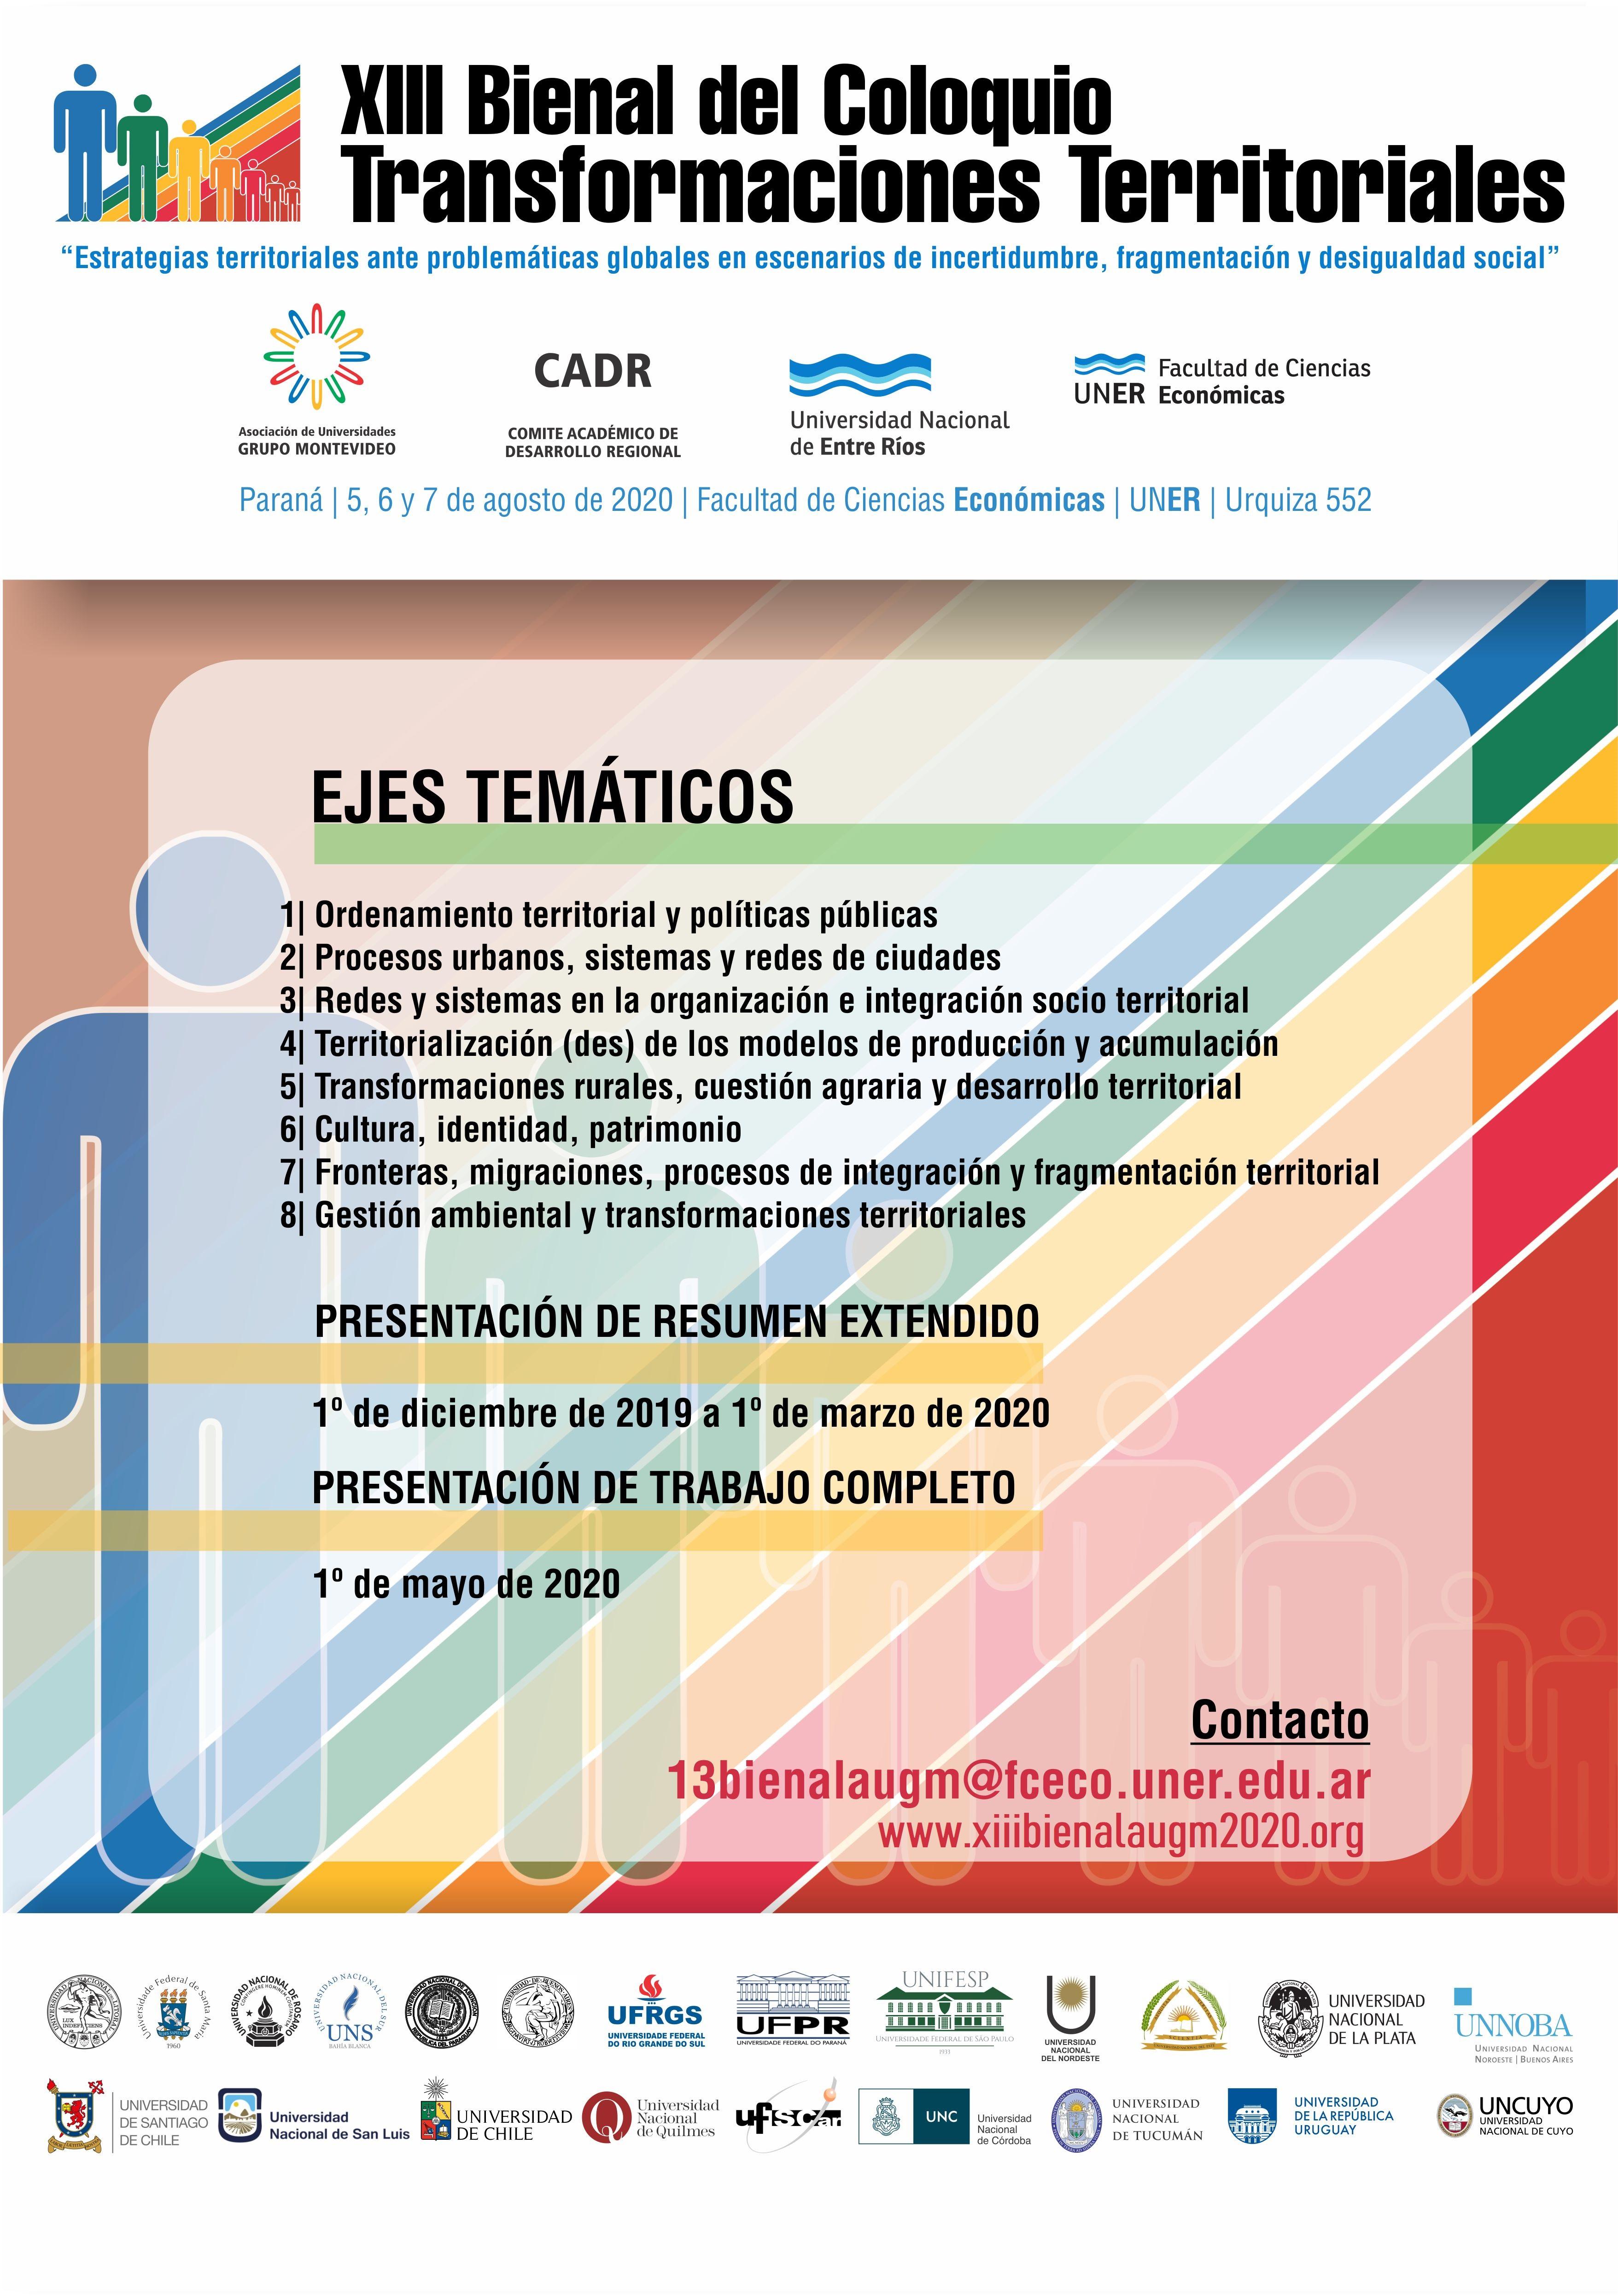 Tercera Circular XIII Bienal del Coloquio de Transformaciones Territoriales 2020